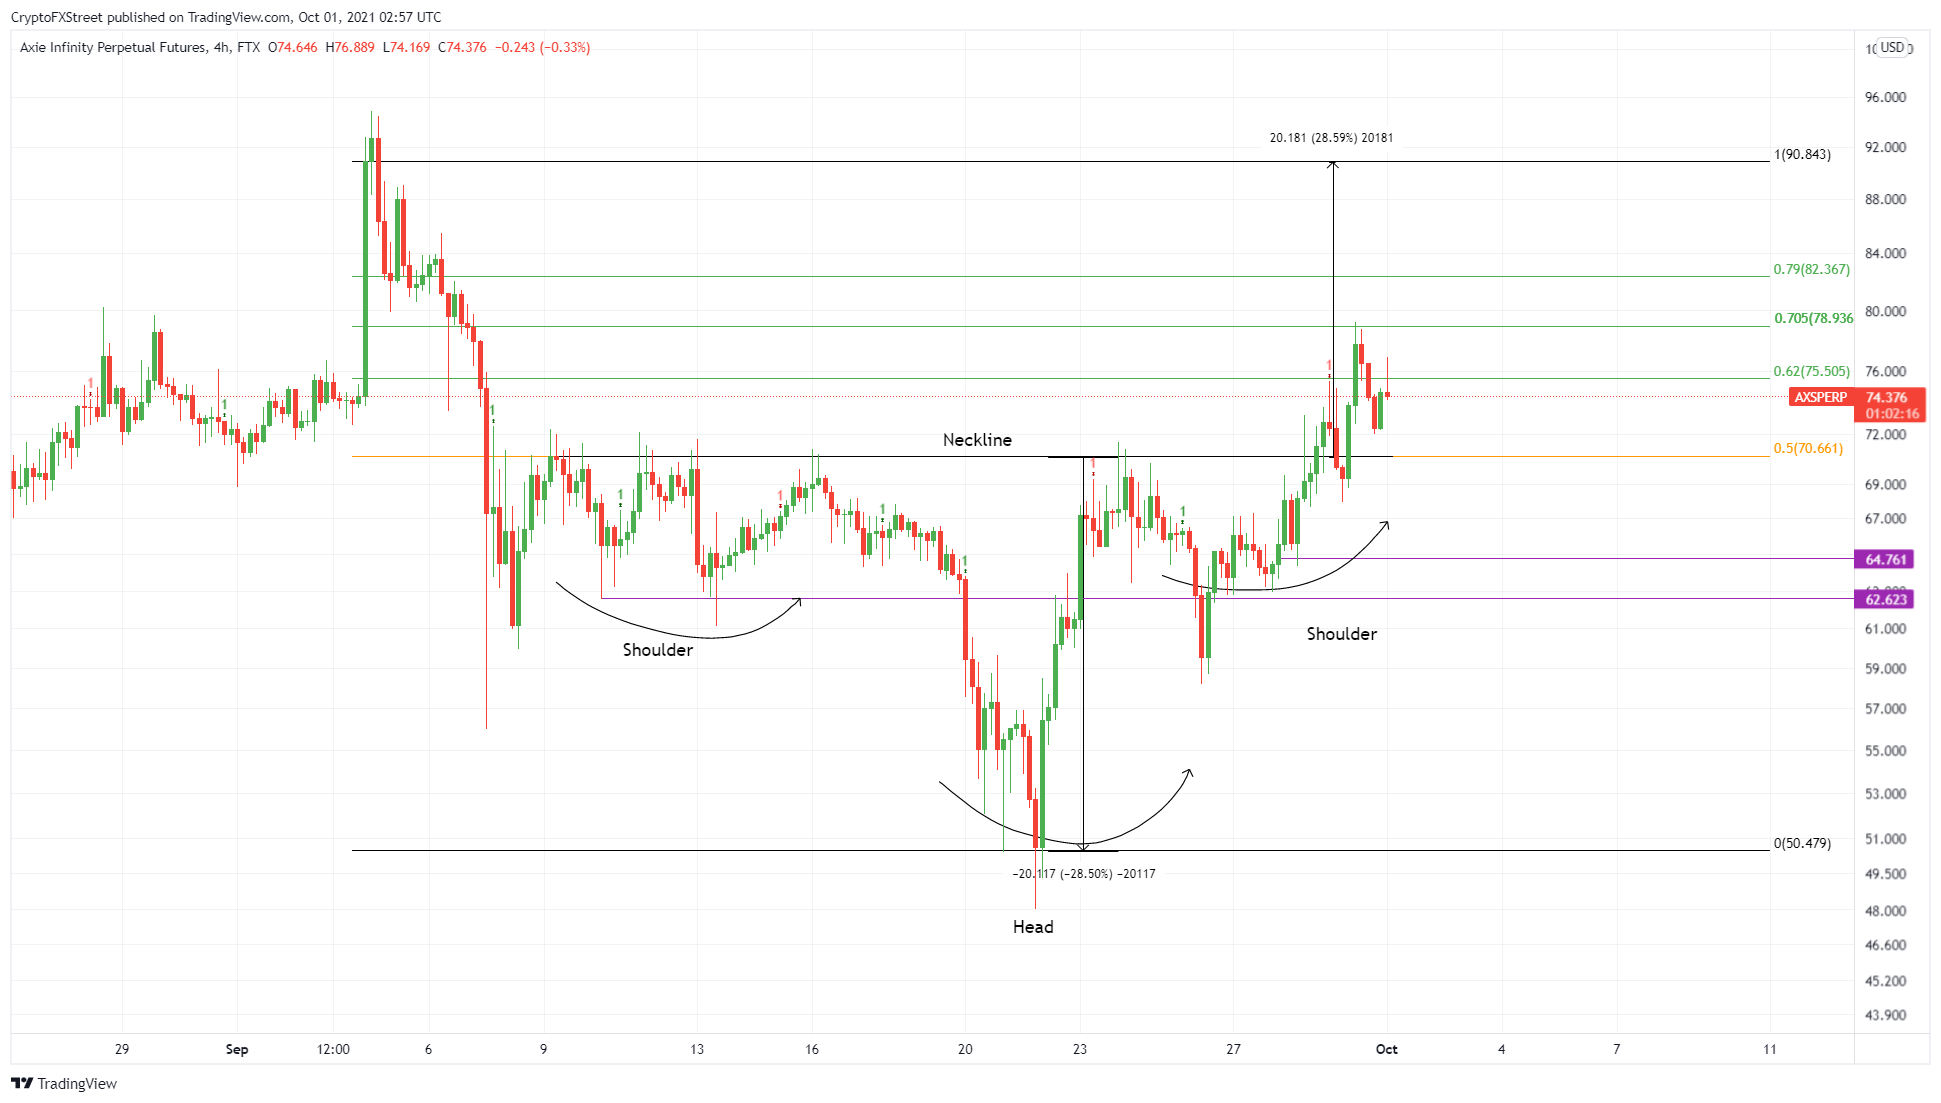 AXS/USDT 4-hour chart